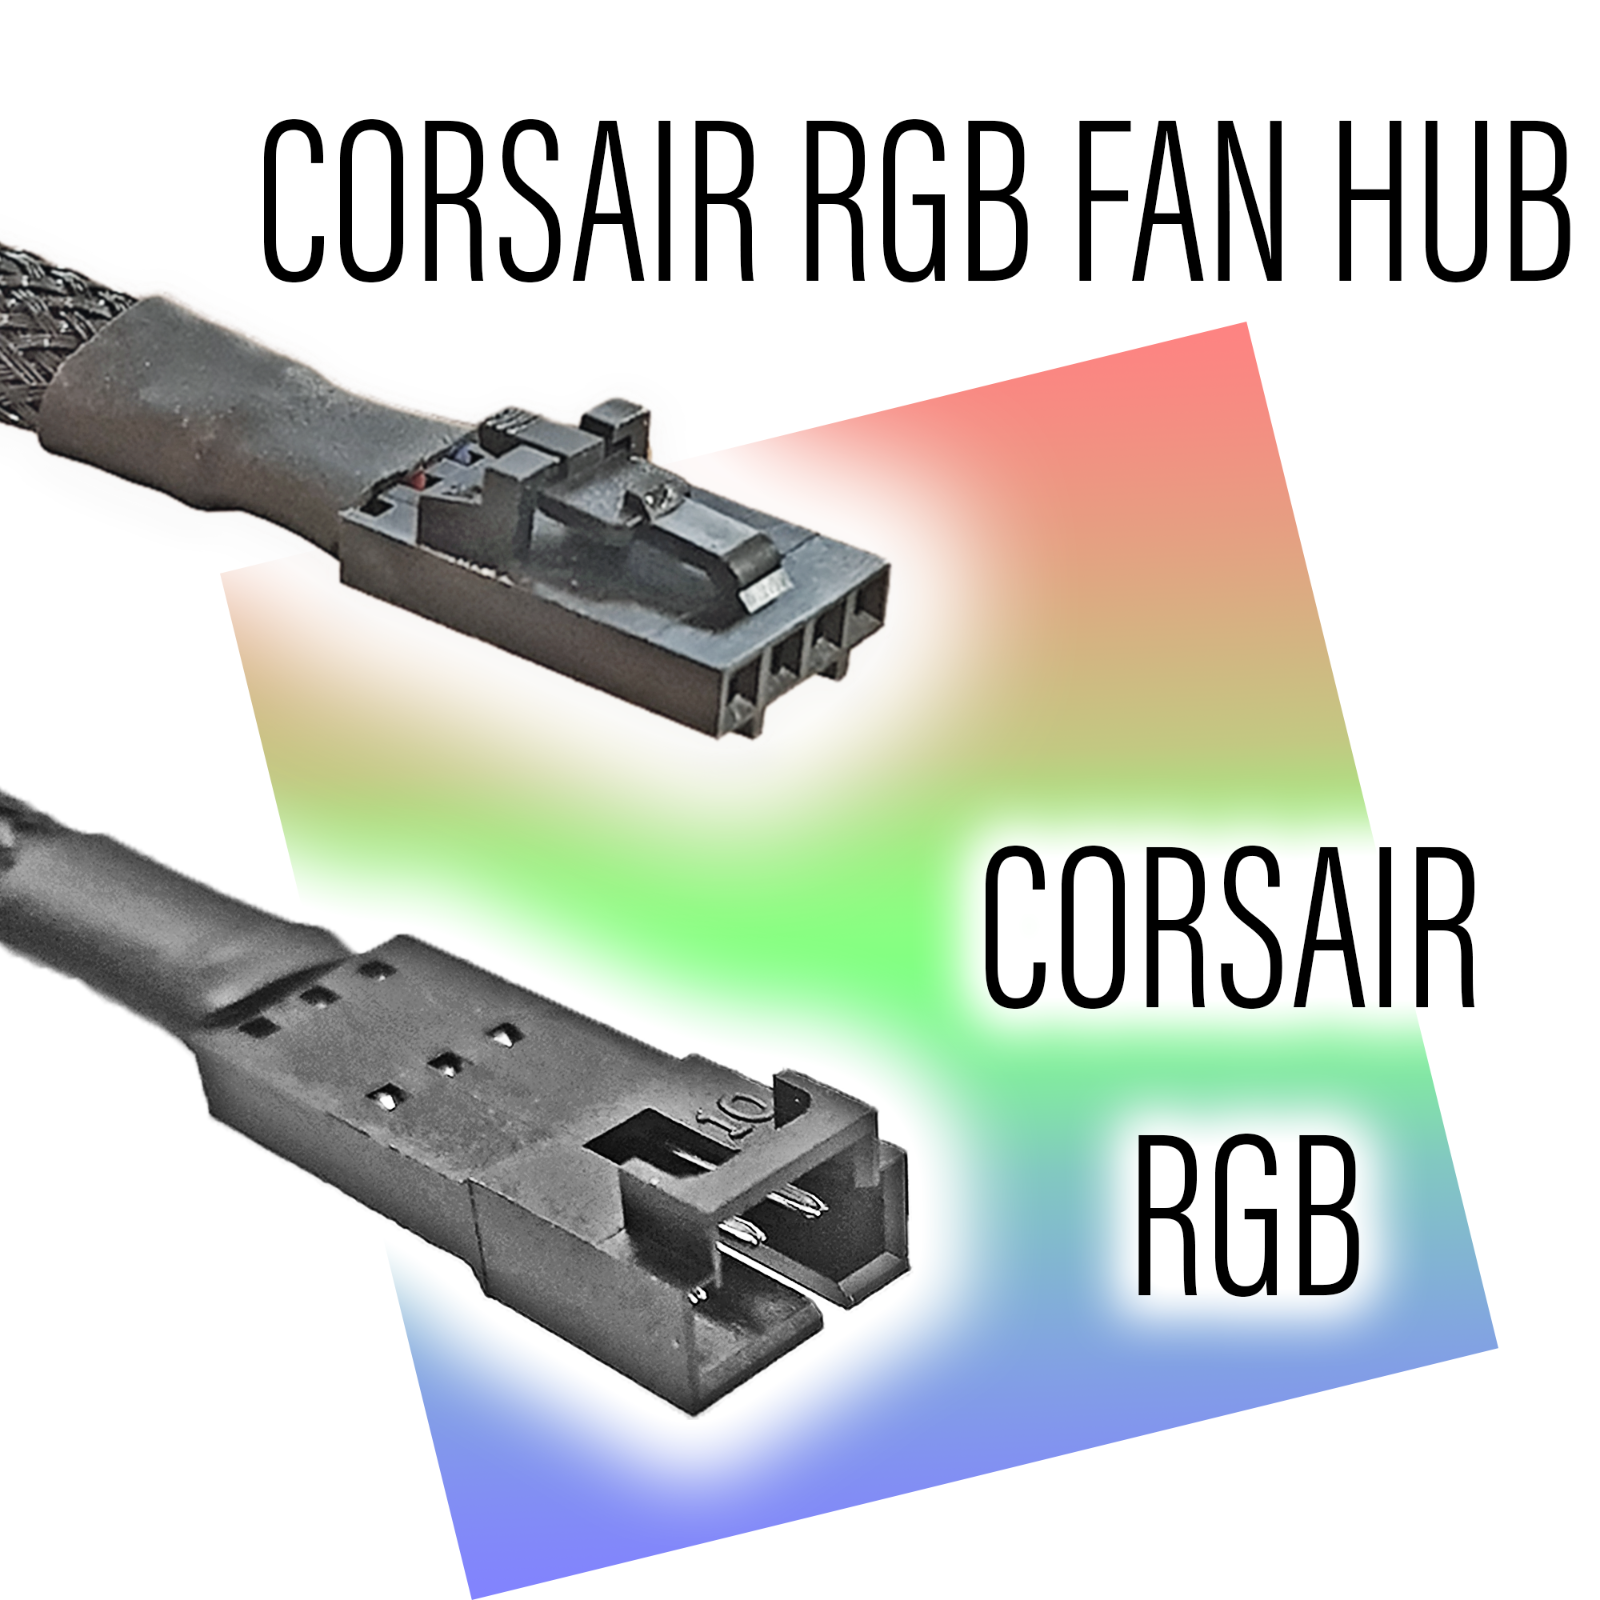 Corsair RGB Fan Hub to Corsair RGB Strip Adapter